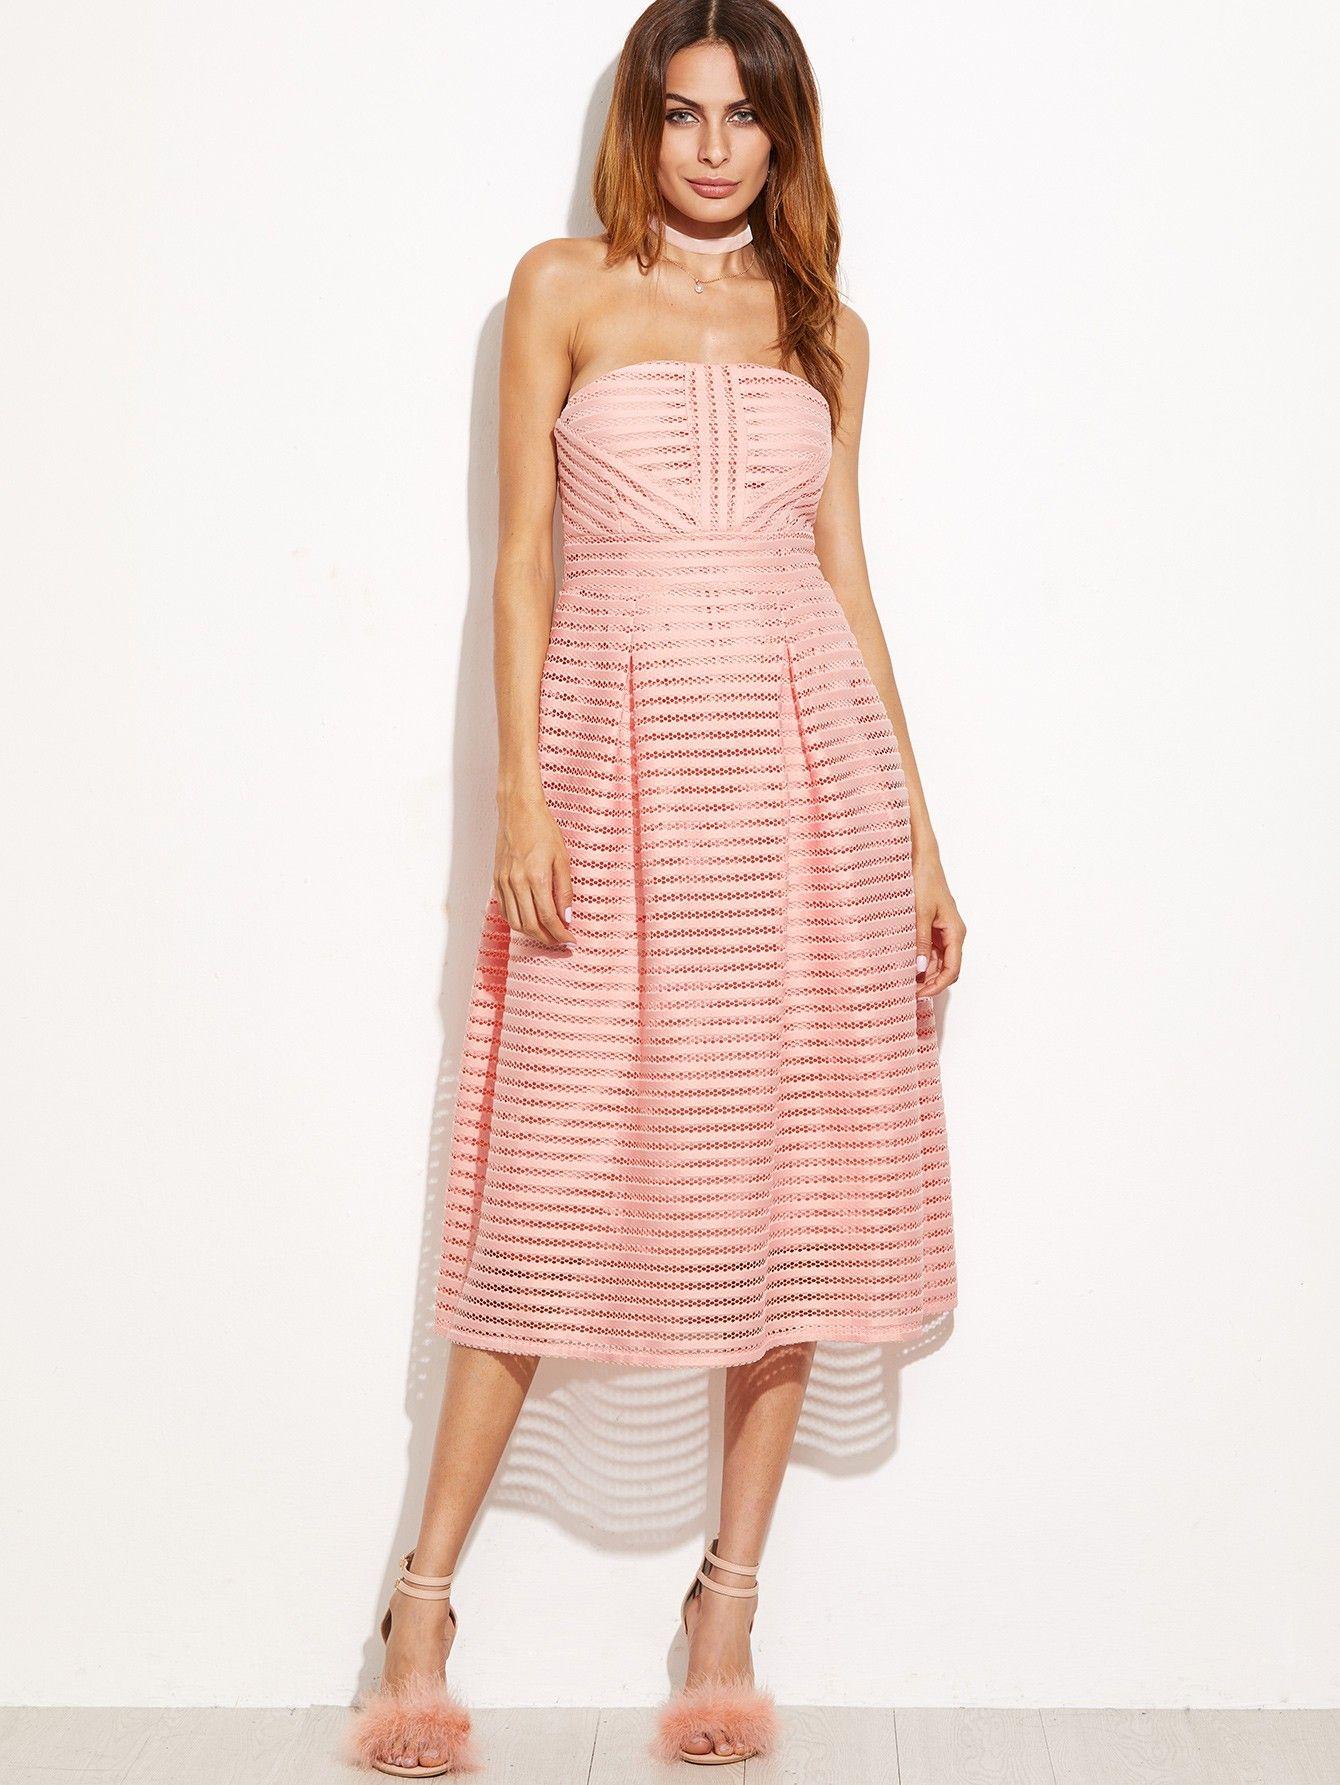 Trägerloses Kleid 2017 Rosa | Kleider 2017 | Pinterest | Trägerloses ...